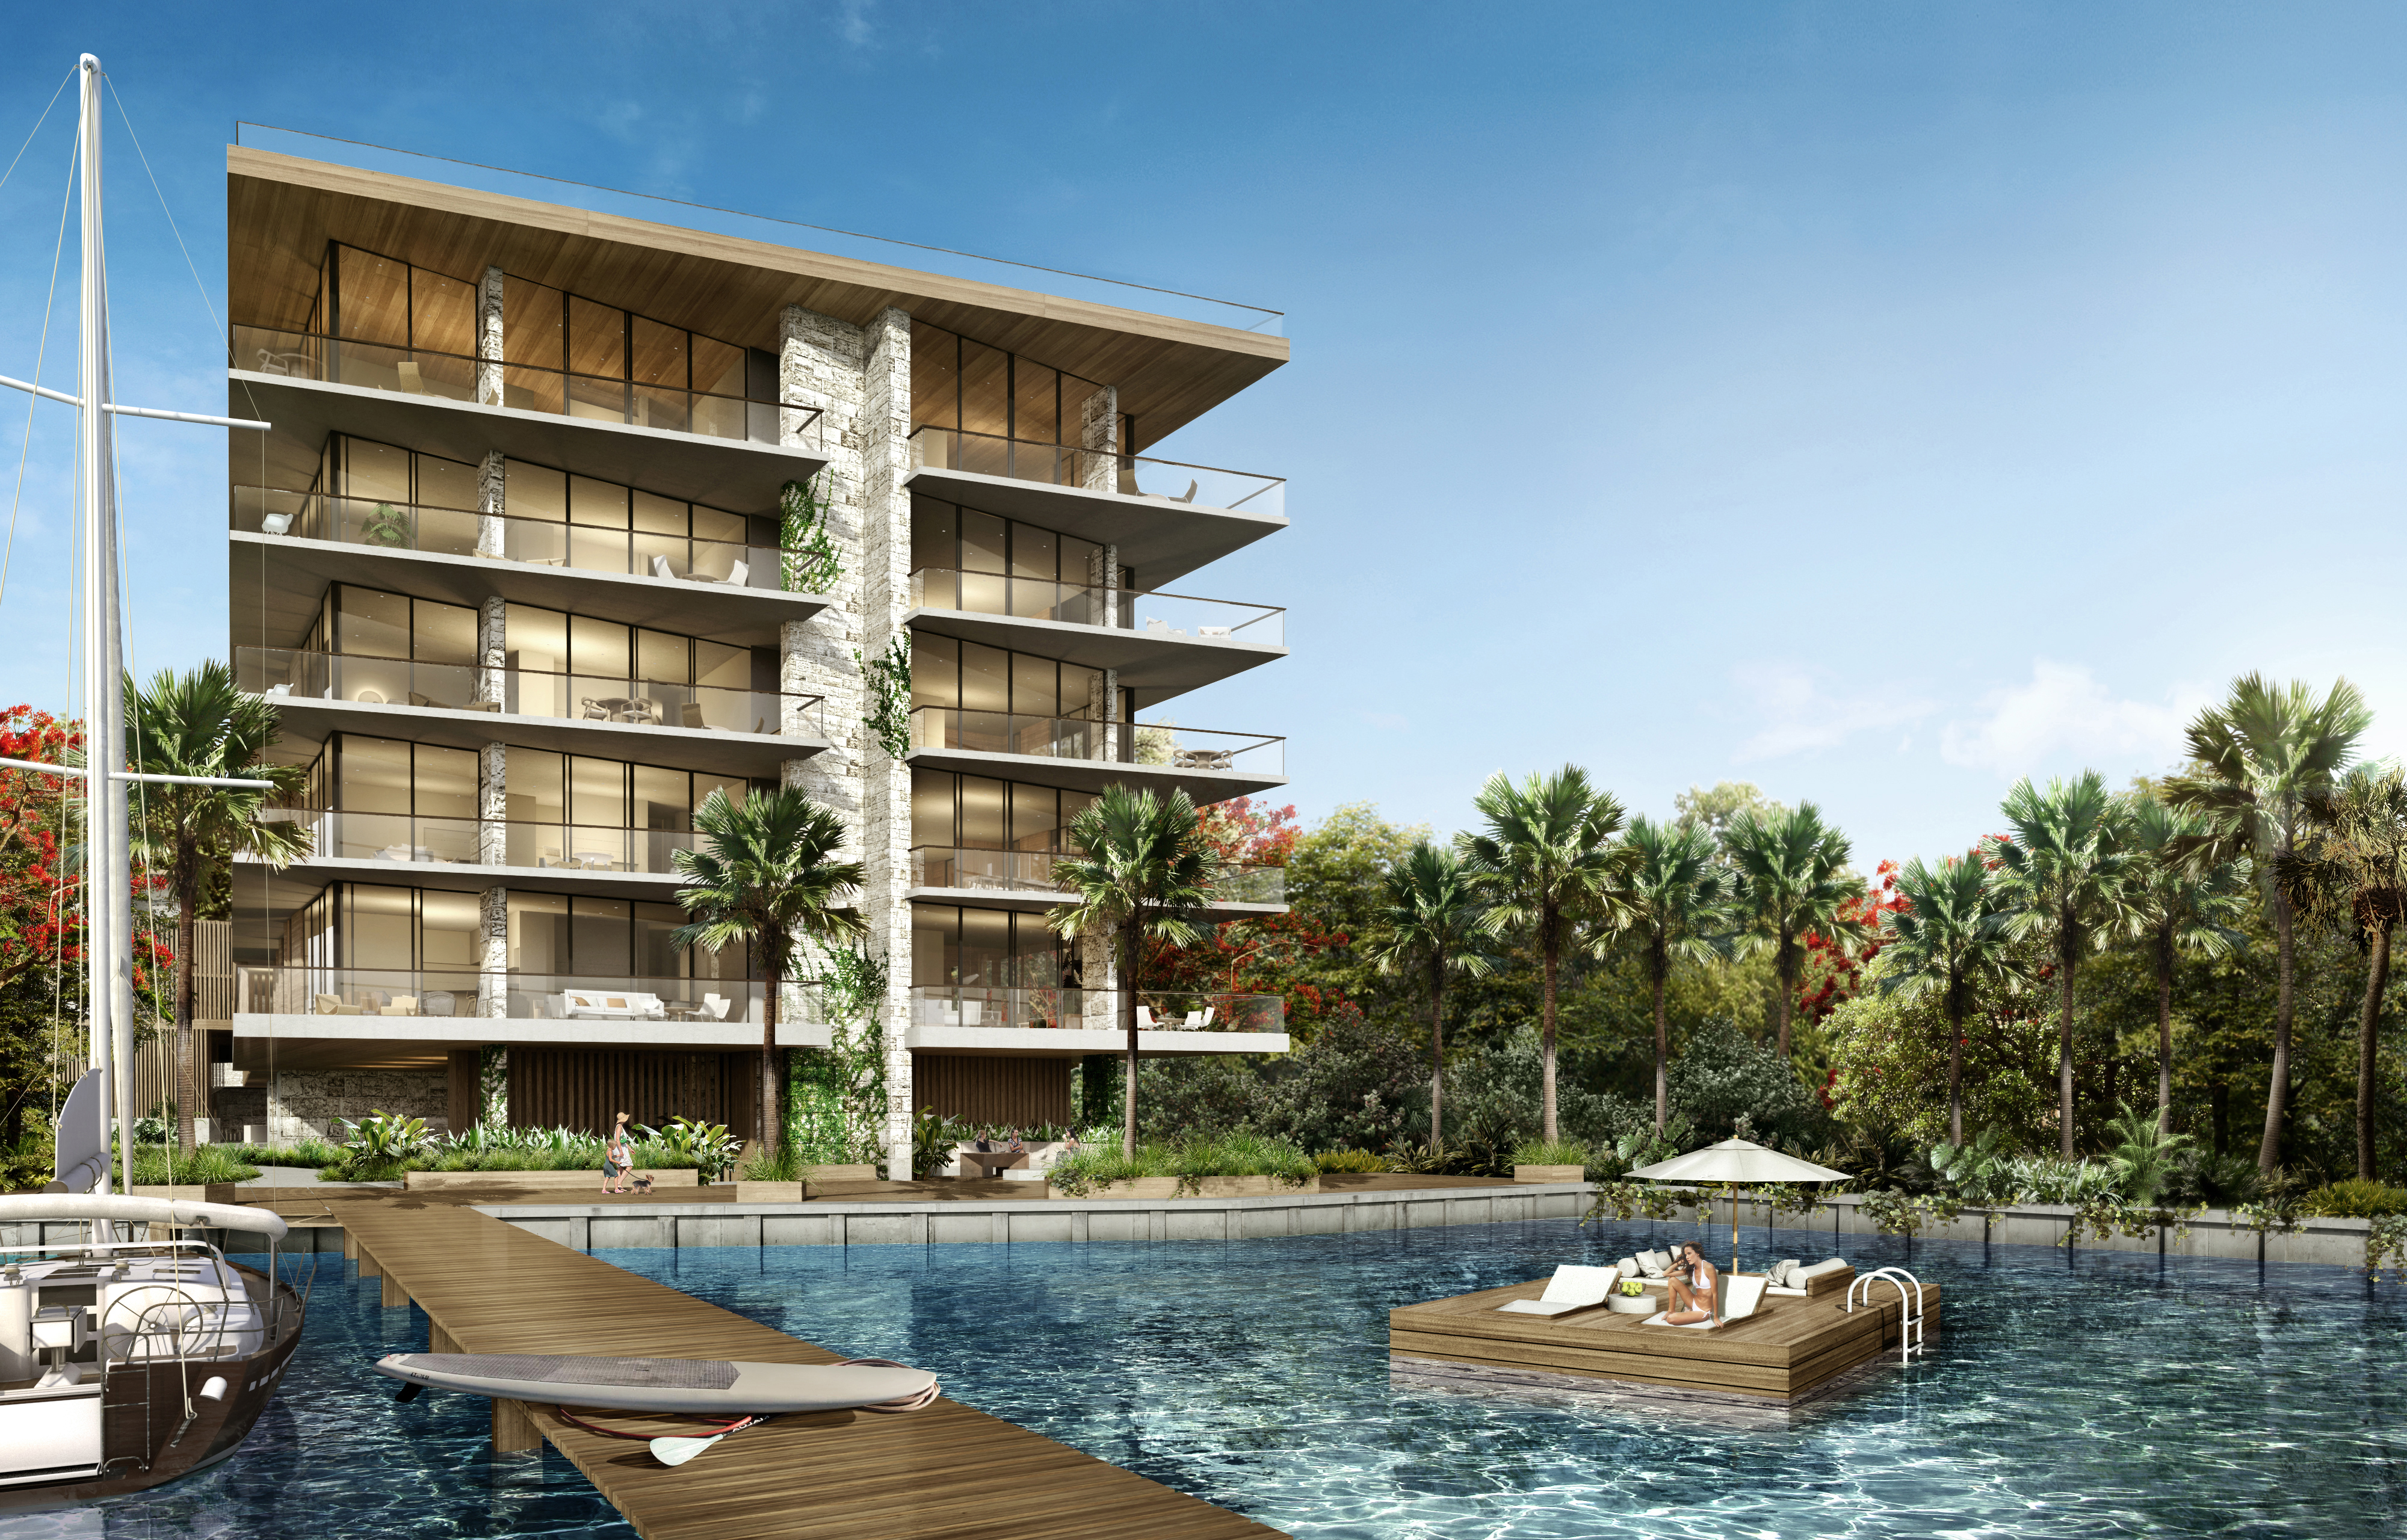 Condominium for Sale at 3581 E Glencoe St #207 3581 E Glencoe St 207 Miami, Florida, 33133 United States